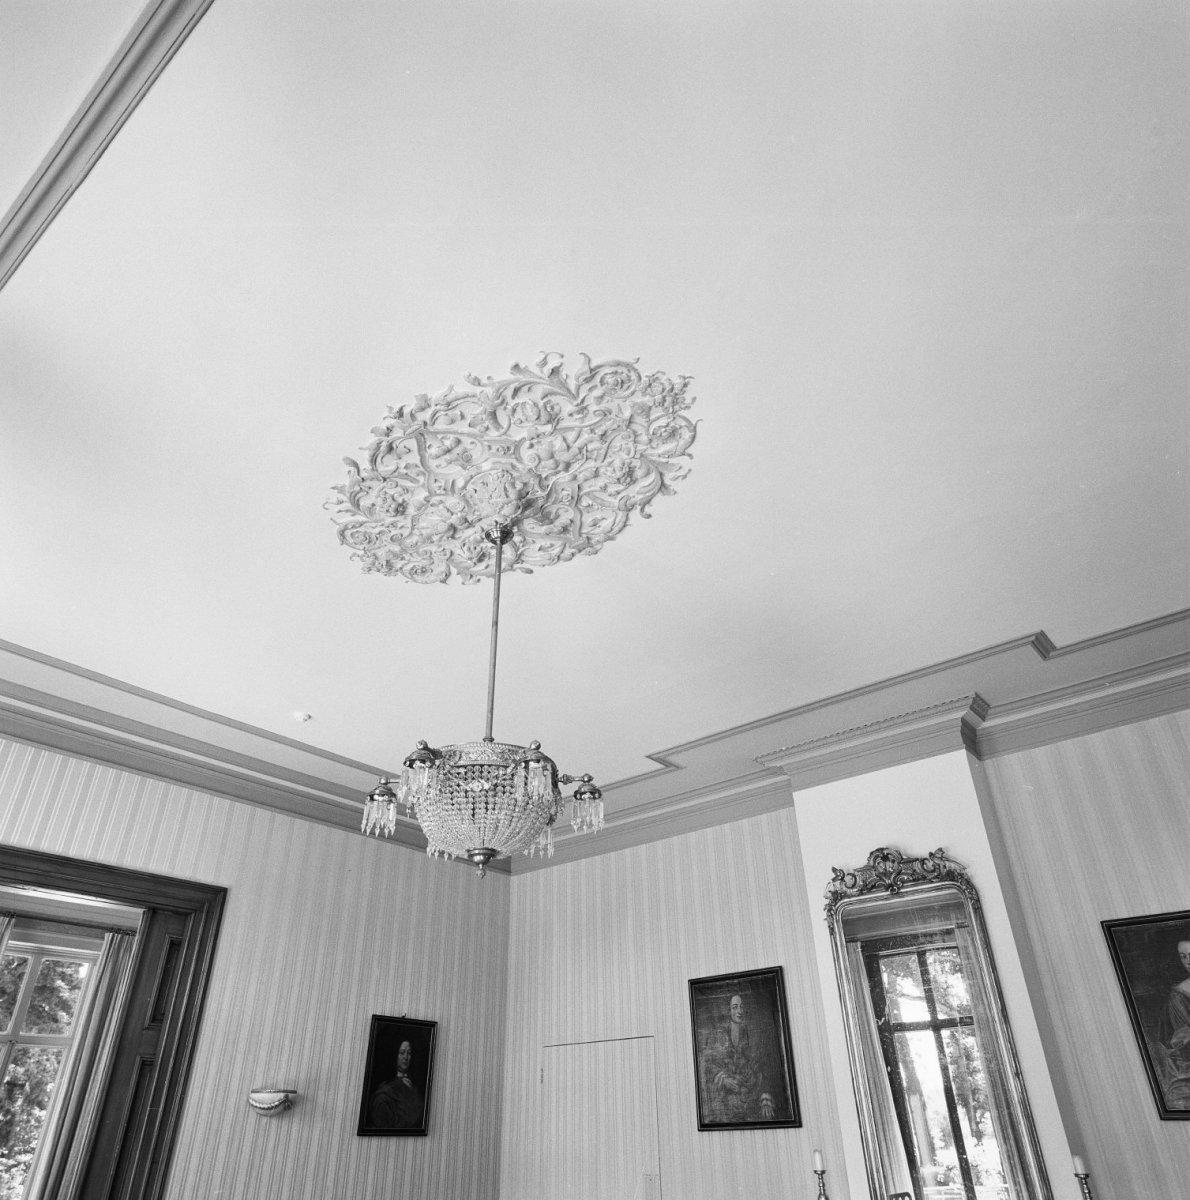 File:Int. grote woonkamer, plafond, ornament - Diepenveen ...